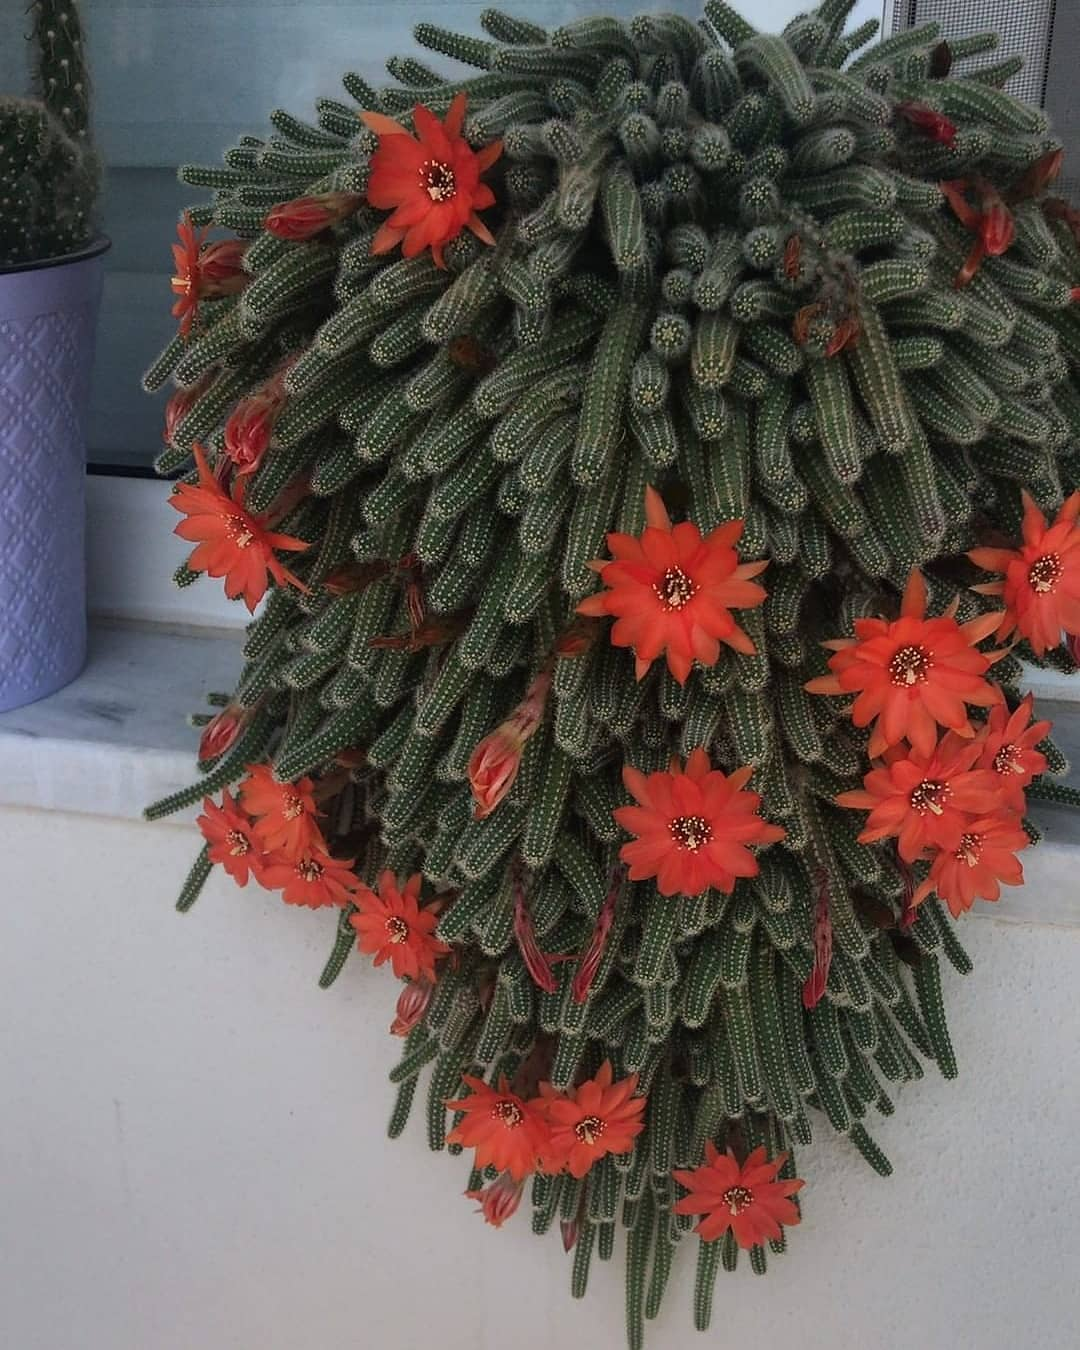 How Often To Water Cactus